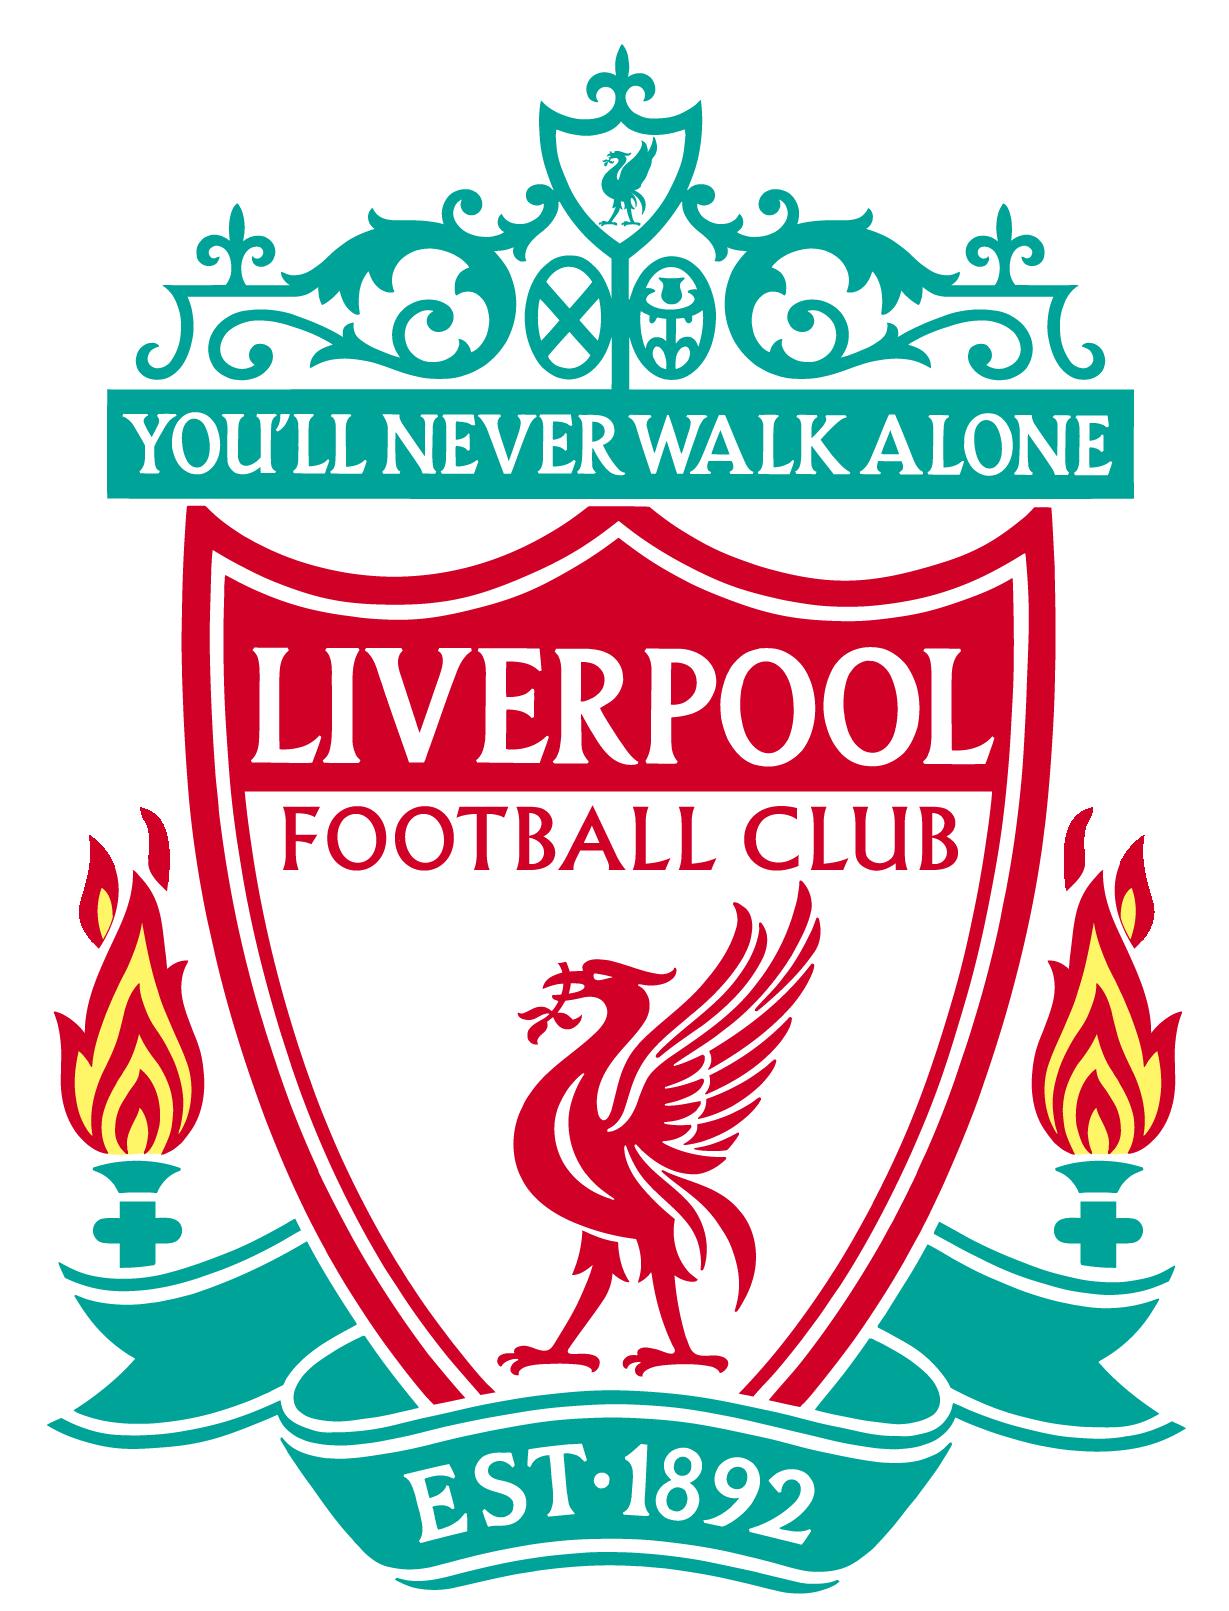 Liverpool Logo Download Vector สโมสรฟุตบอลลิเวอร์พูล